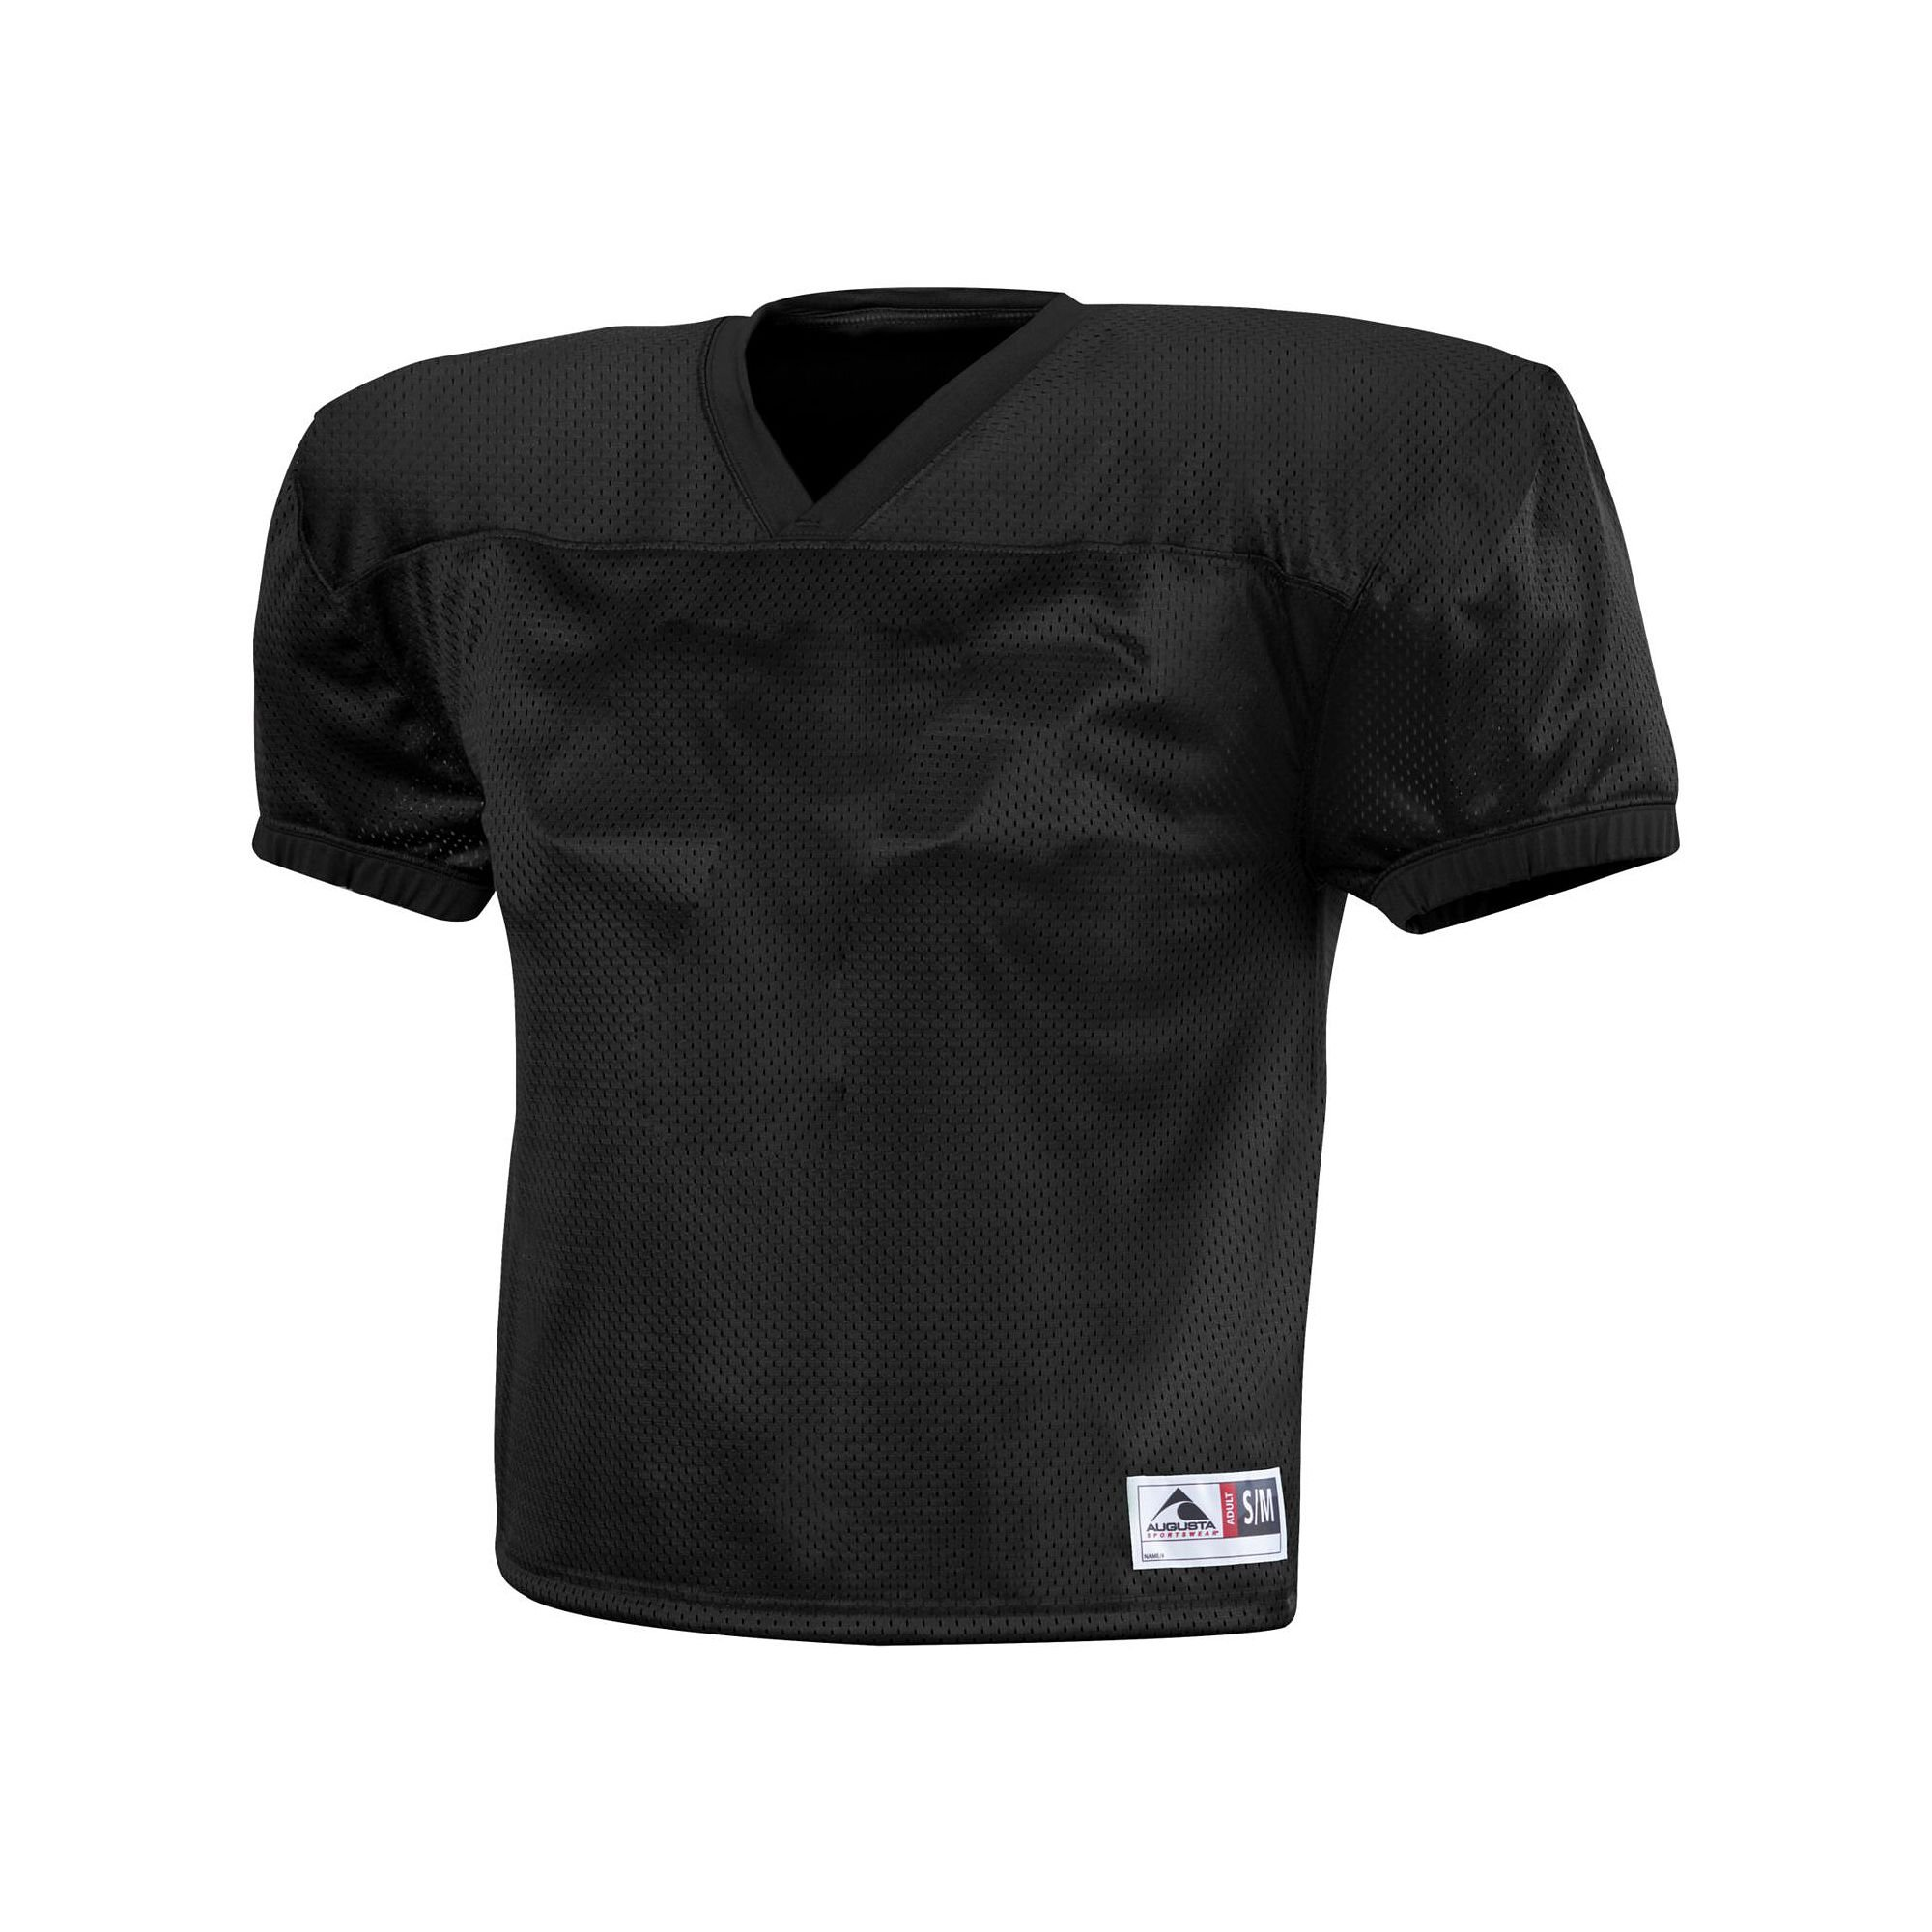 Augusta Sportswear Boys' Dash Practice Jersey S/M Black